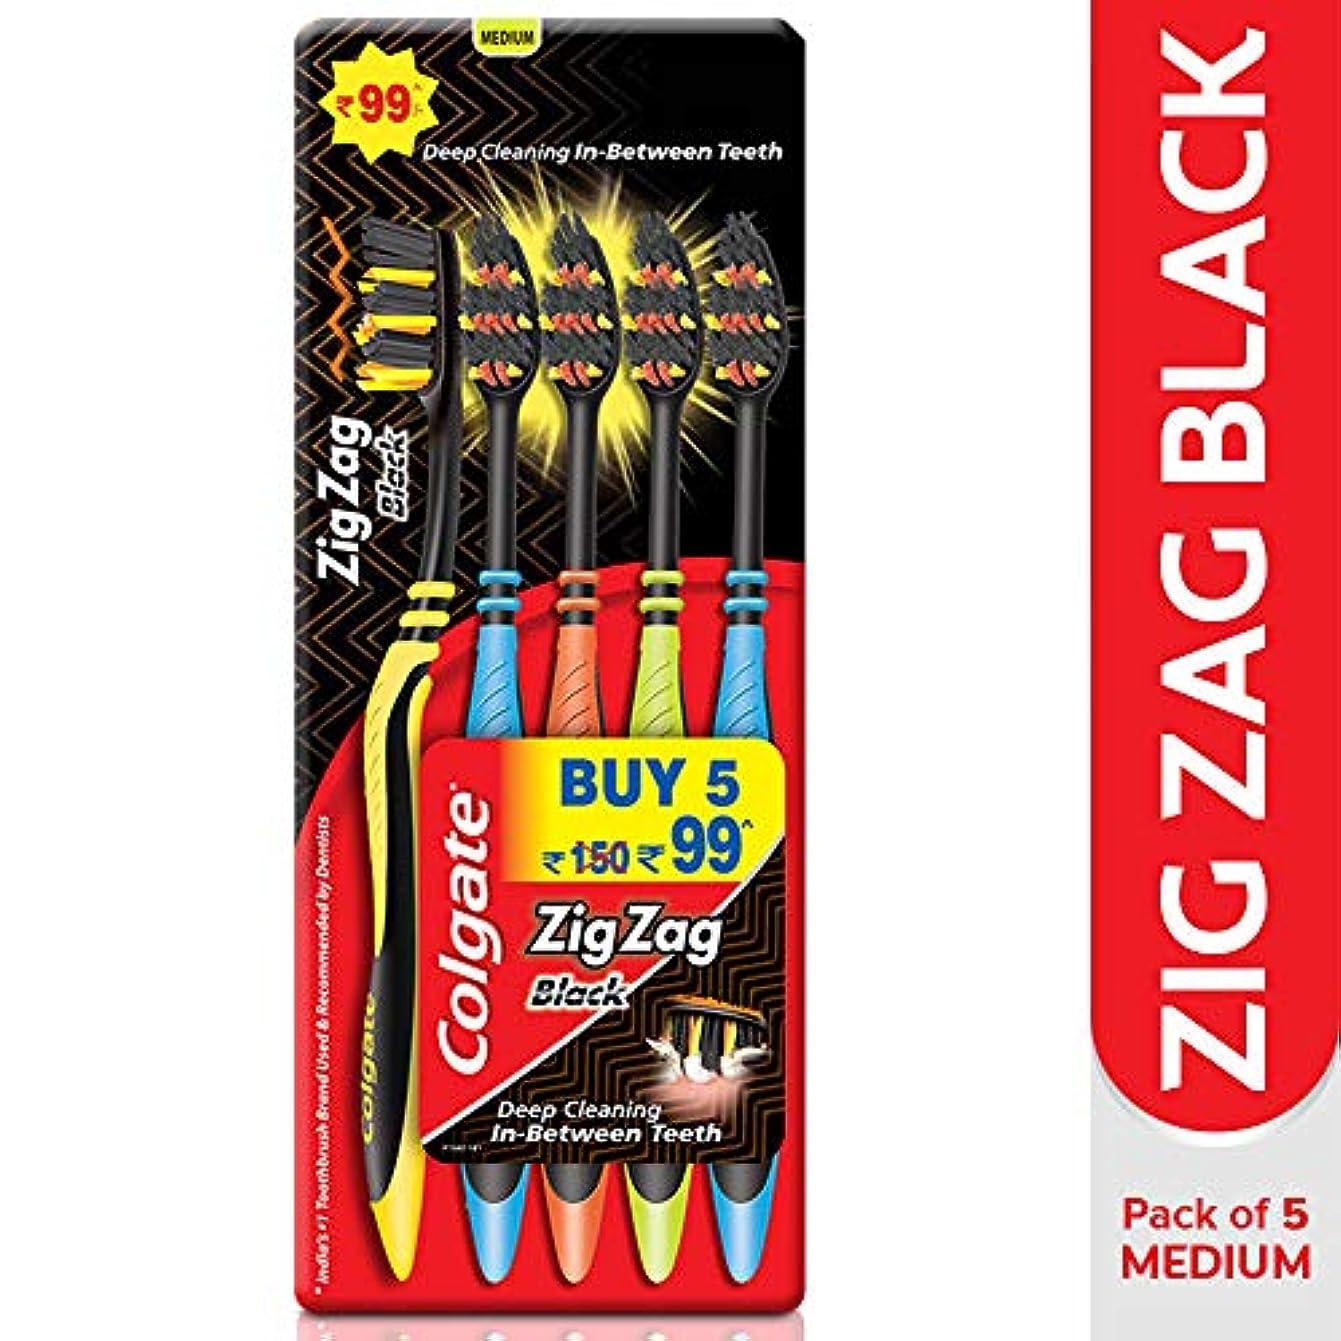 Colgate Zig Zag Black Bristle Toothbrush